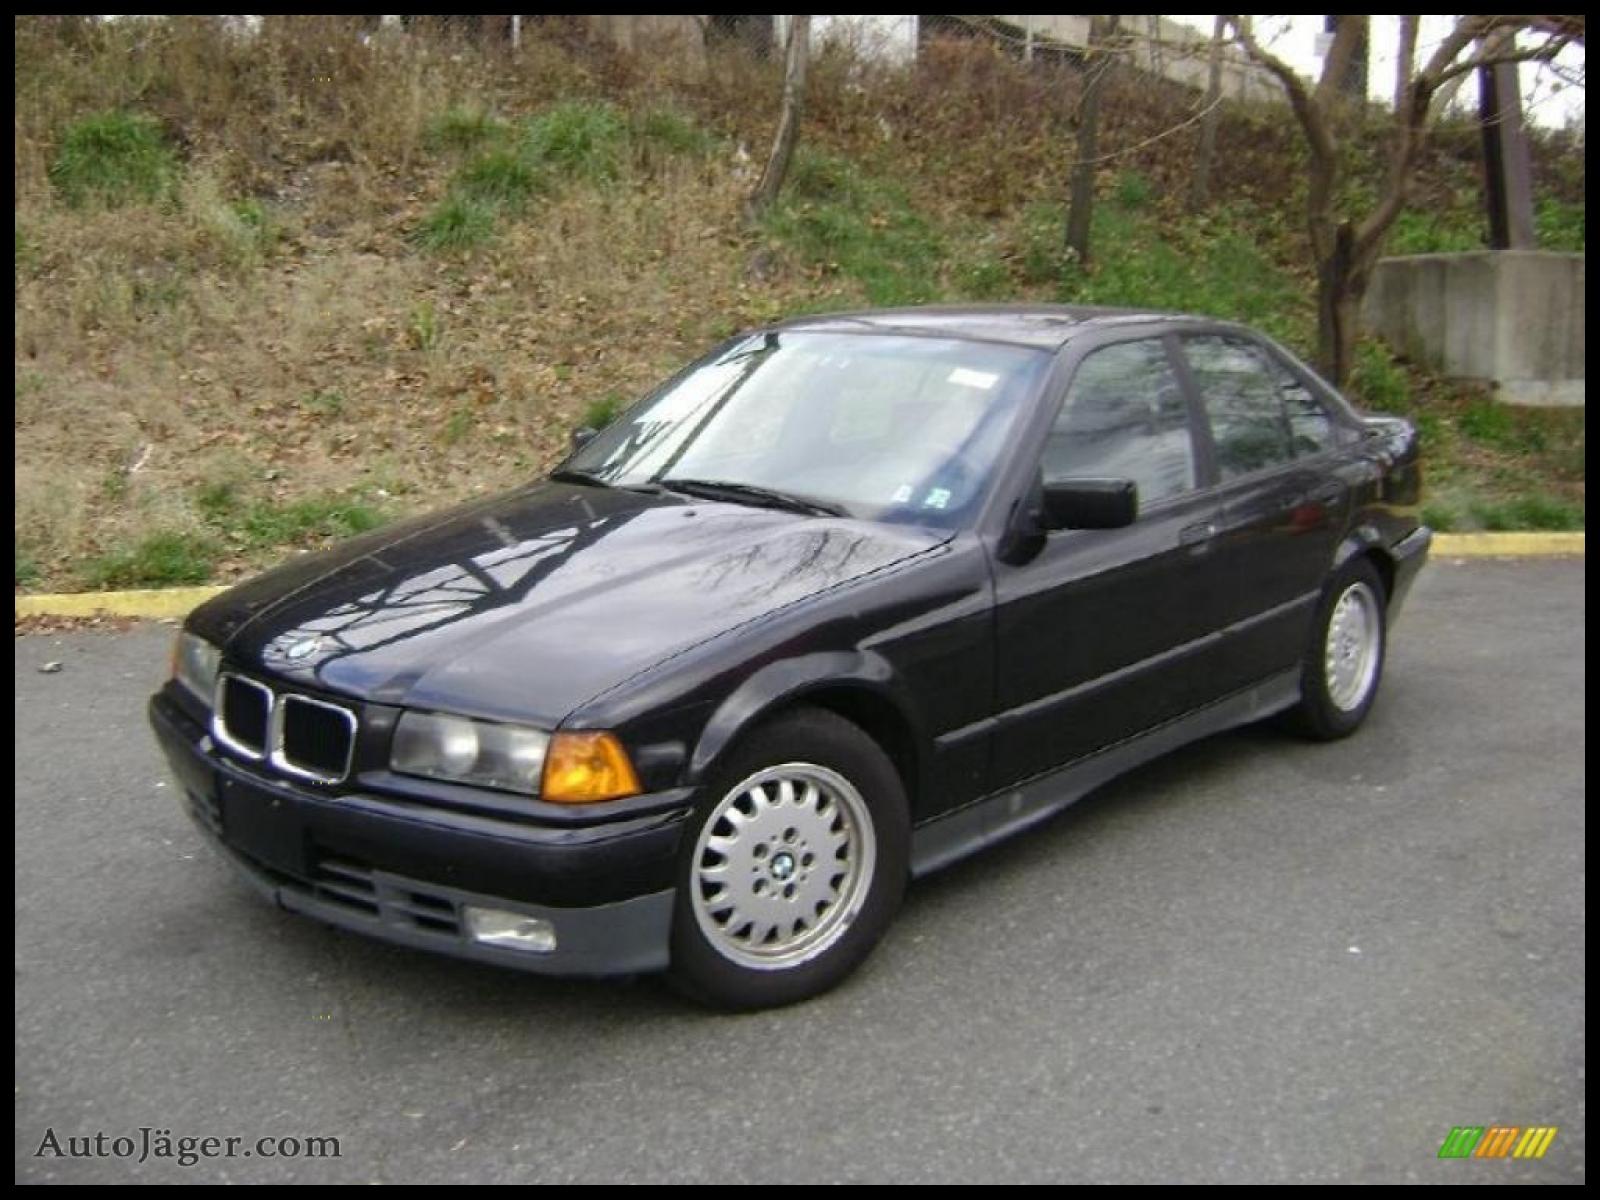 800 1024 1280 1600 origin 1993 BMW 3 Series